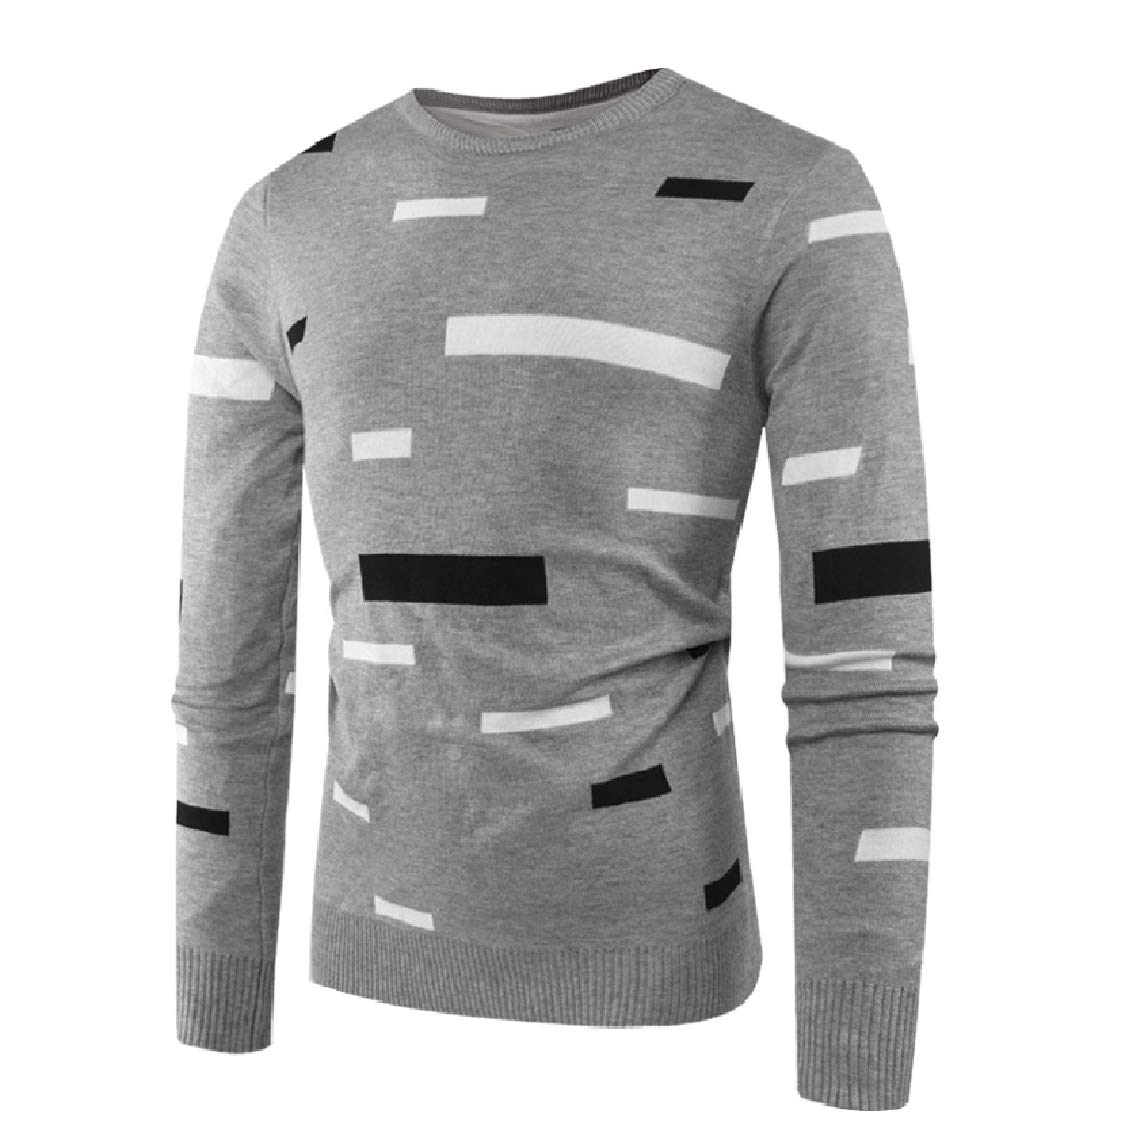 LinkShowMen Spring//Autumn Stripes Color Stitch Crew Neck Knit Pullover Sweater